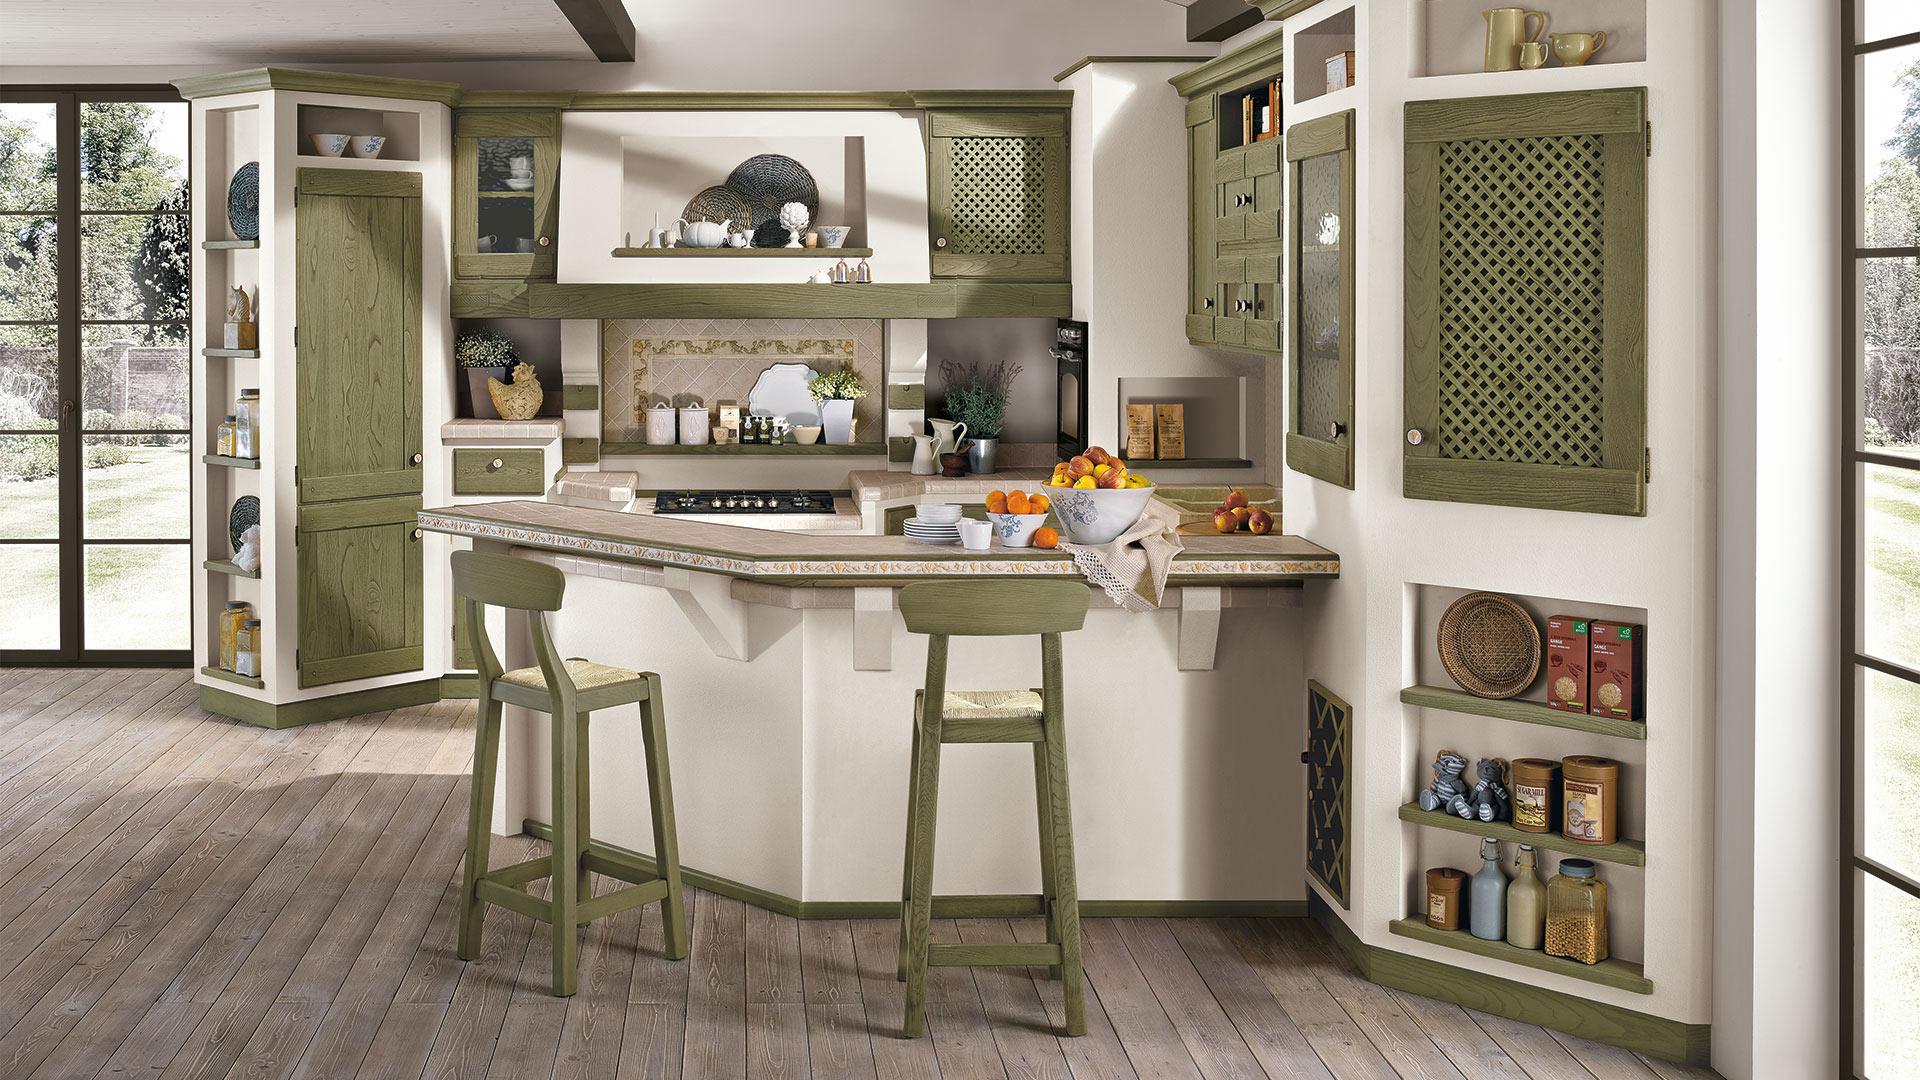 cucina lube borgo antico anita a nardò e lecce